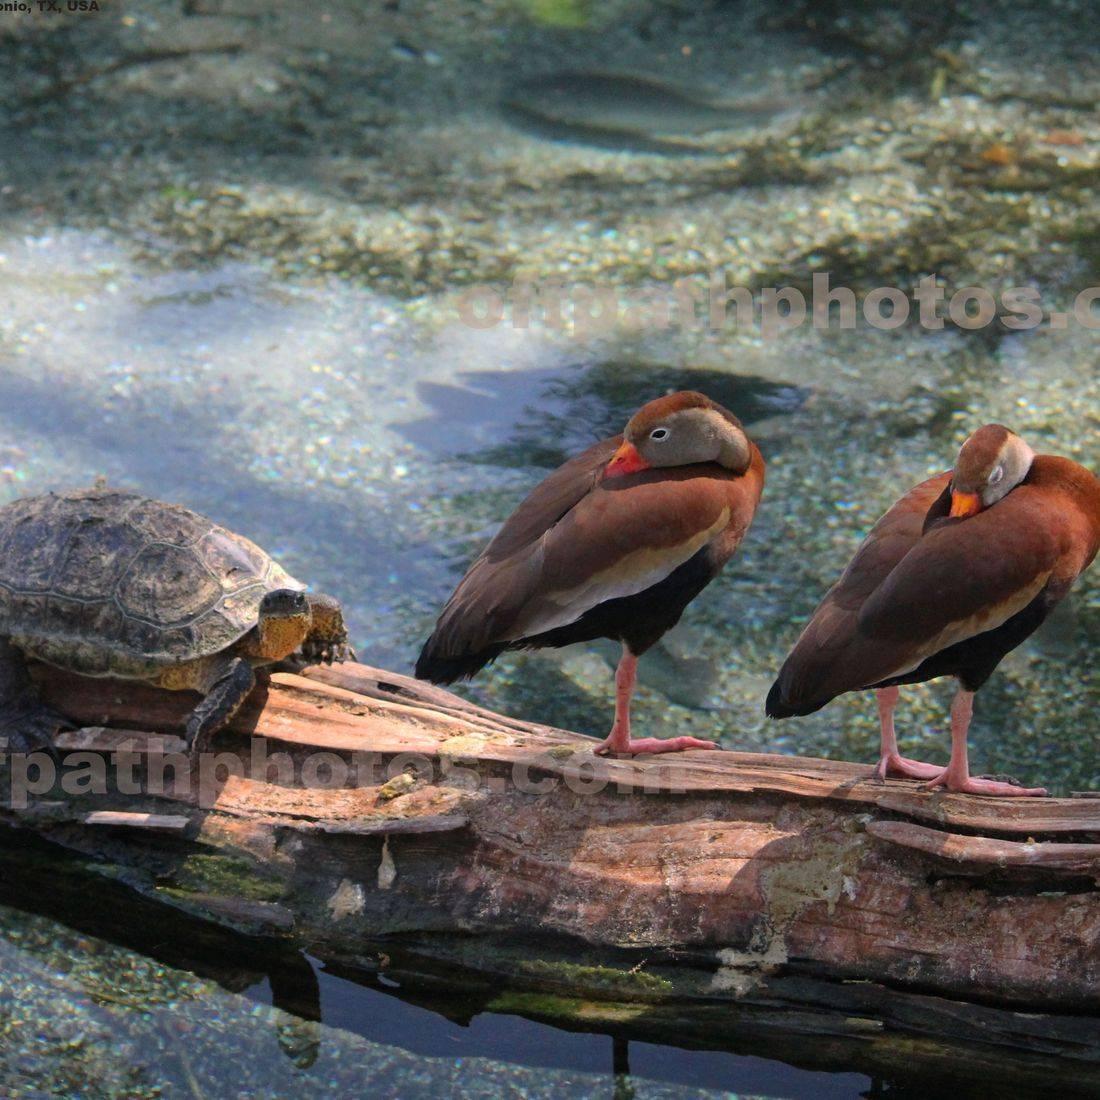 photography, water, animals, ducks, turtle, nature,pond, fish, zoo, log